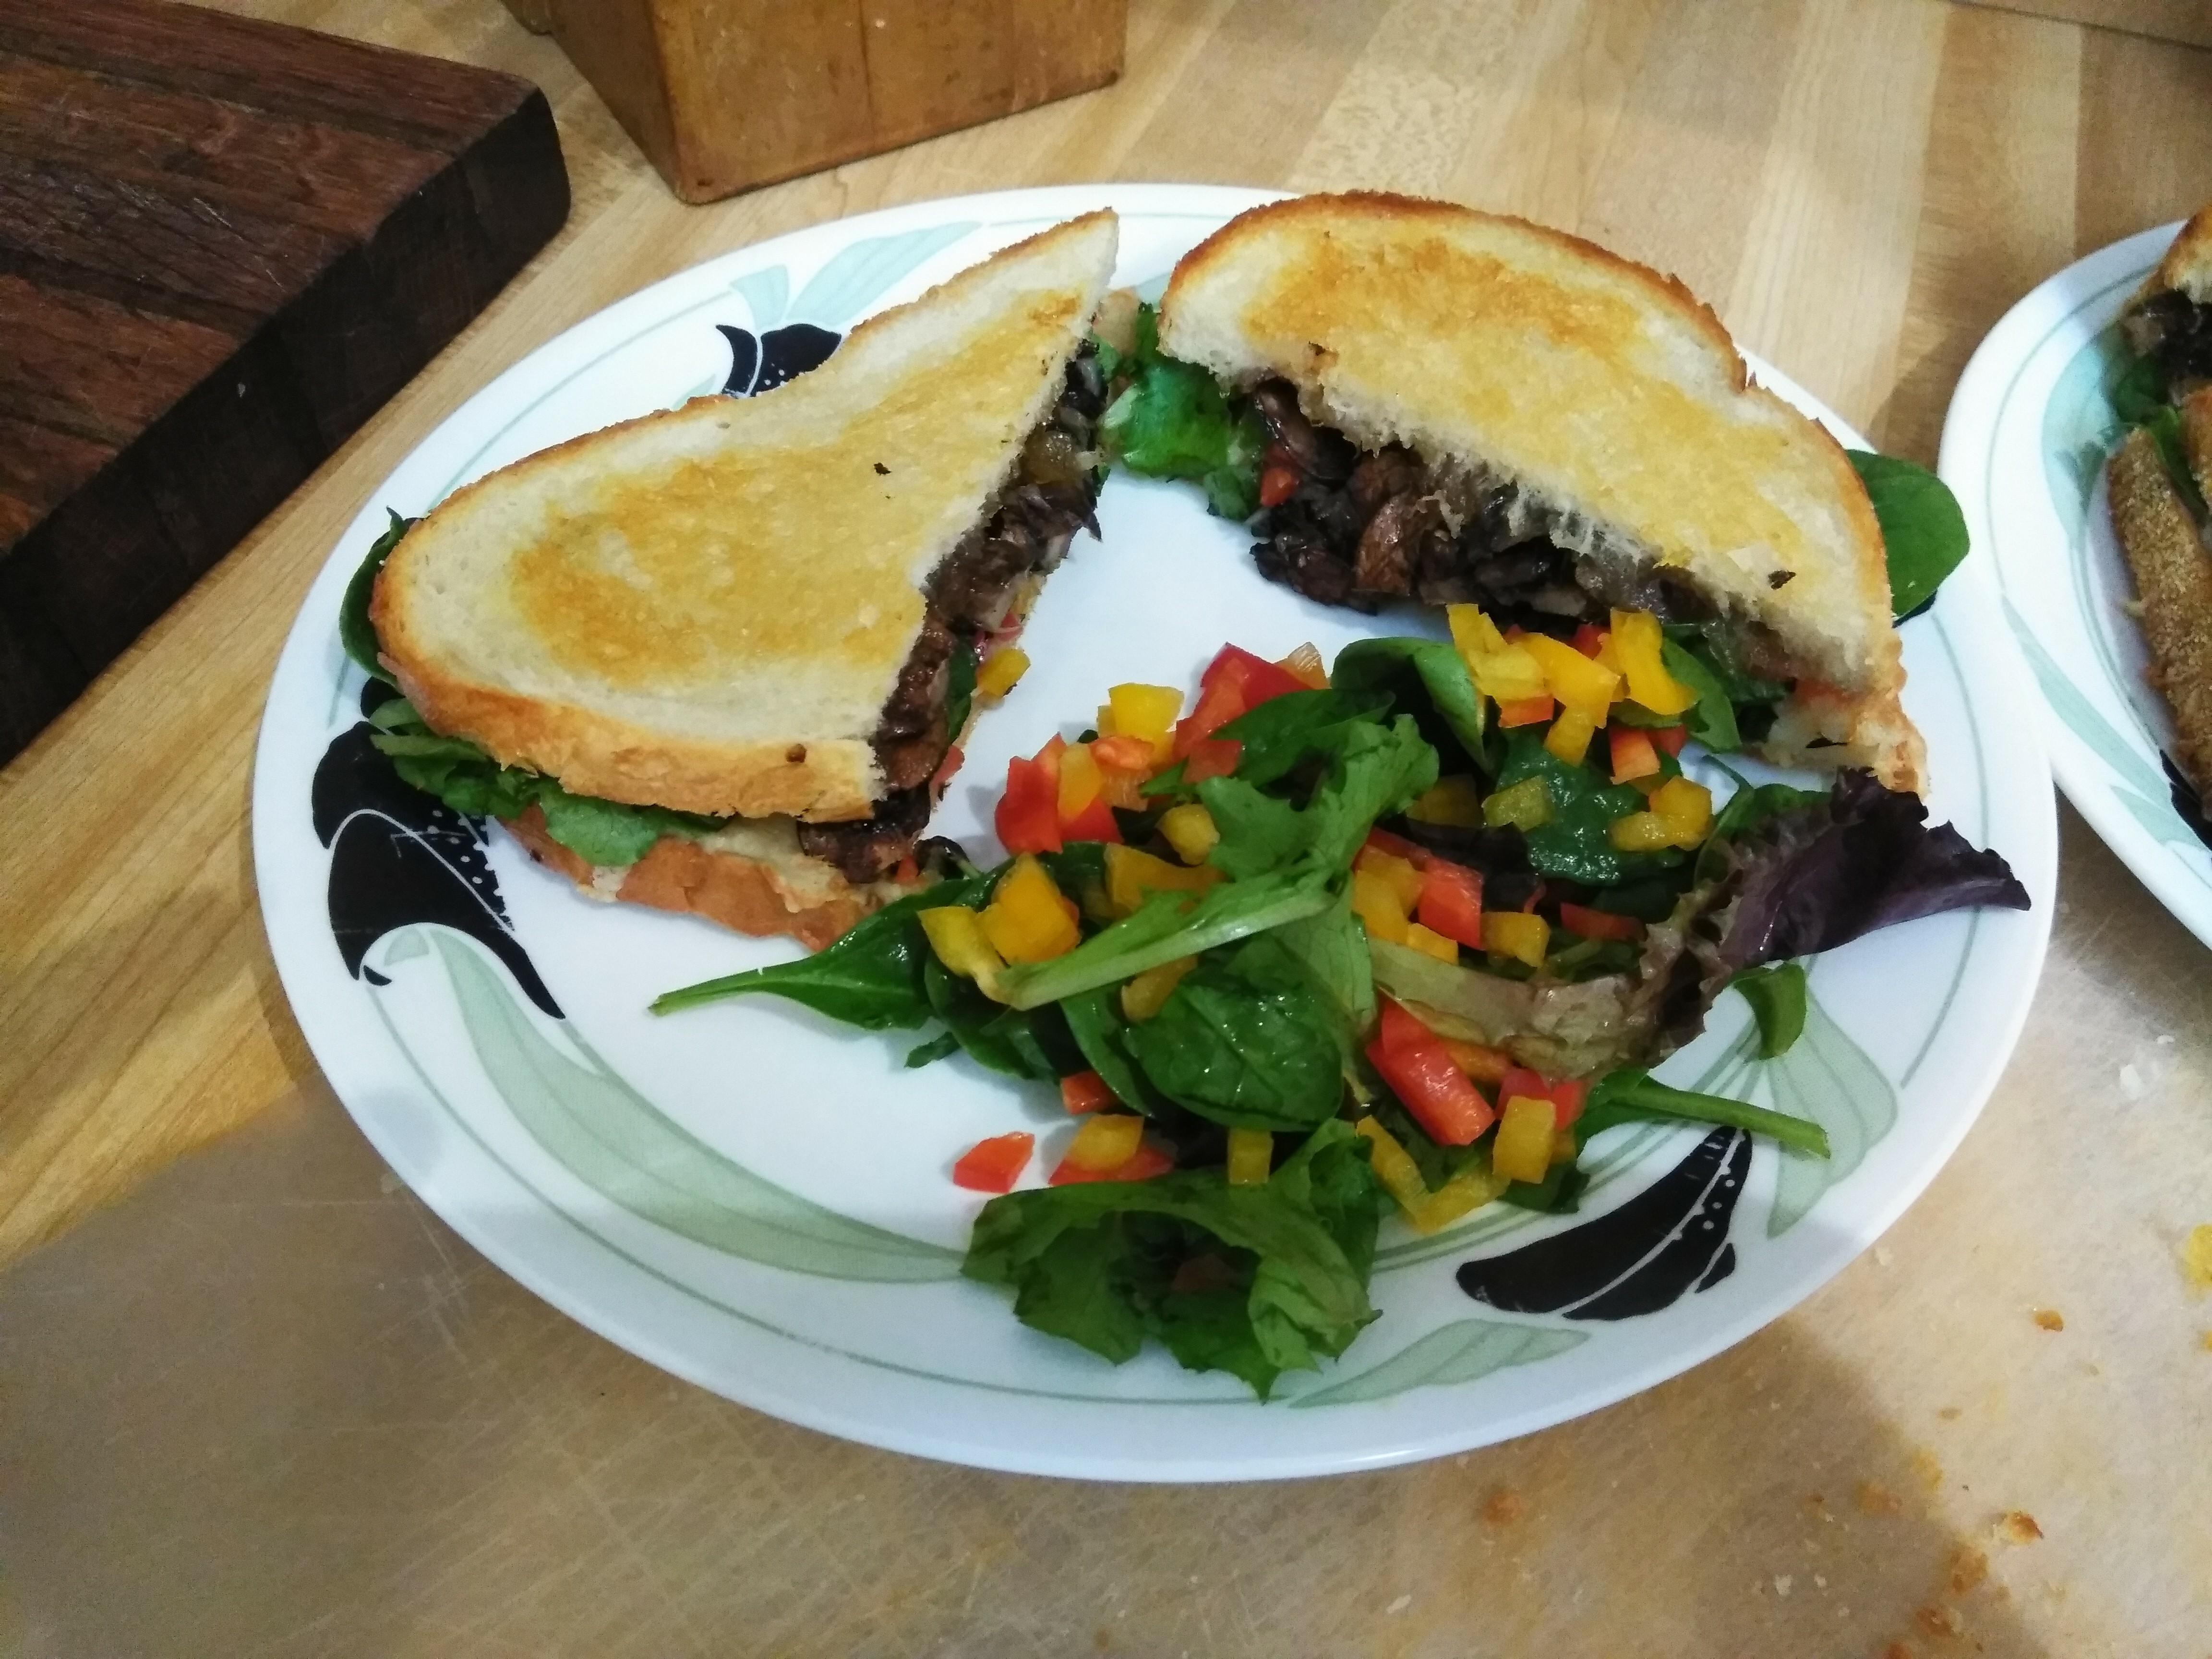 Manchego and Mushroom Sandwiches with Arugula Salad